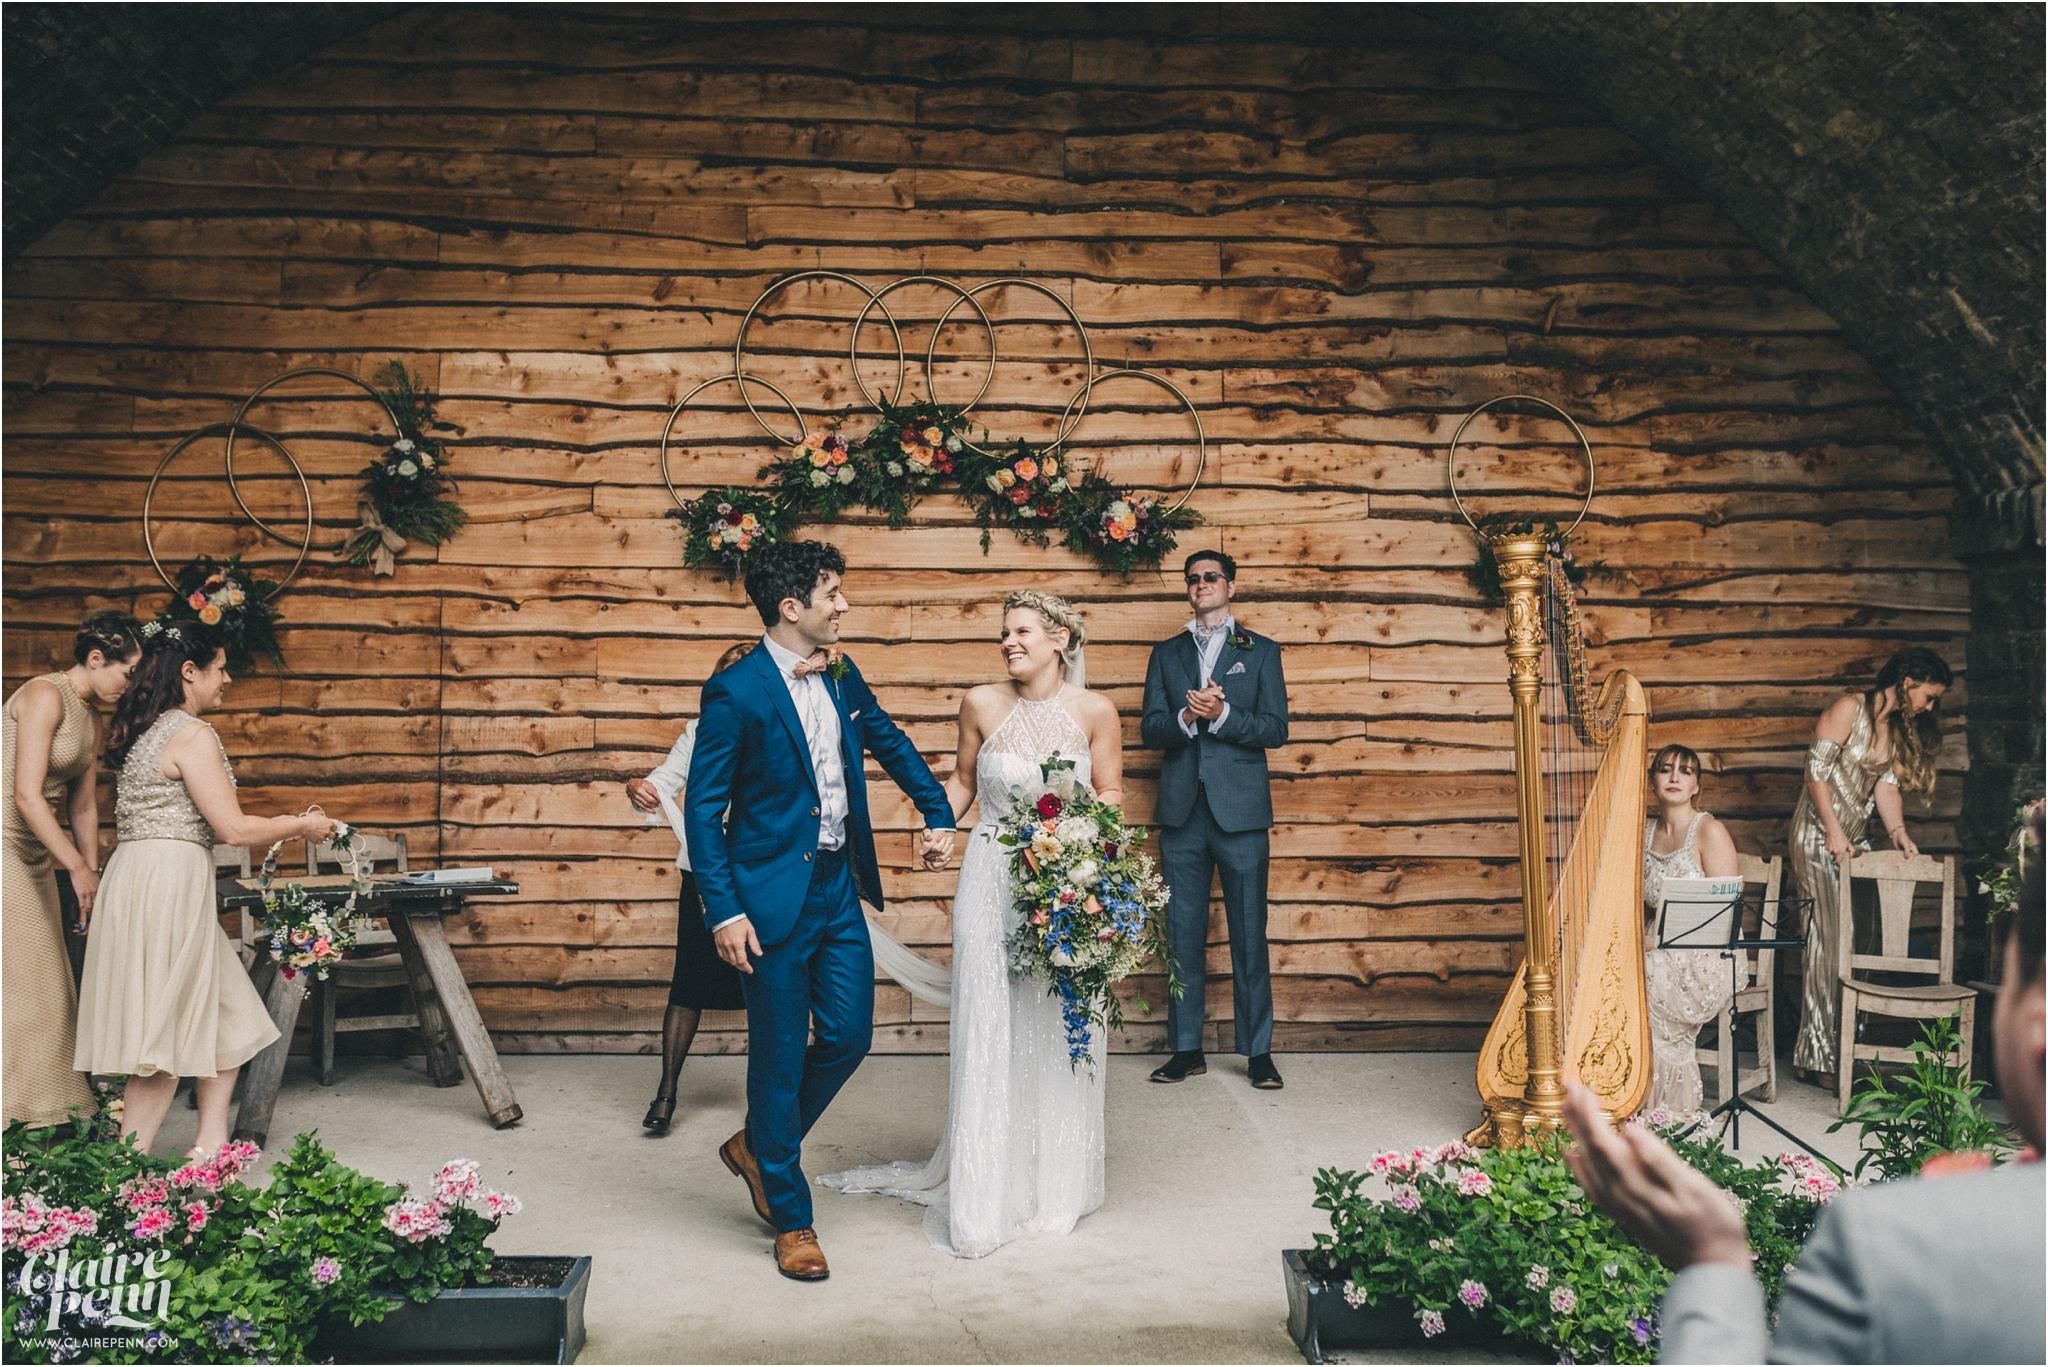 Tower Hills Barn wedding North Wales Llangollen_0084.jpg